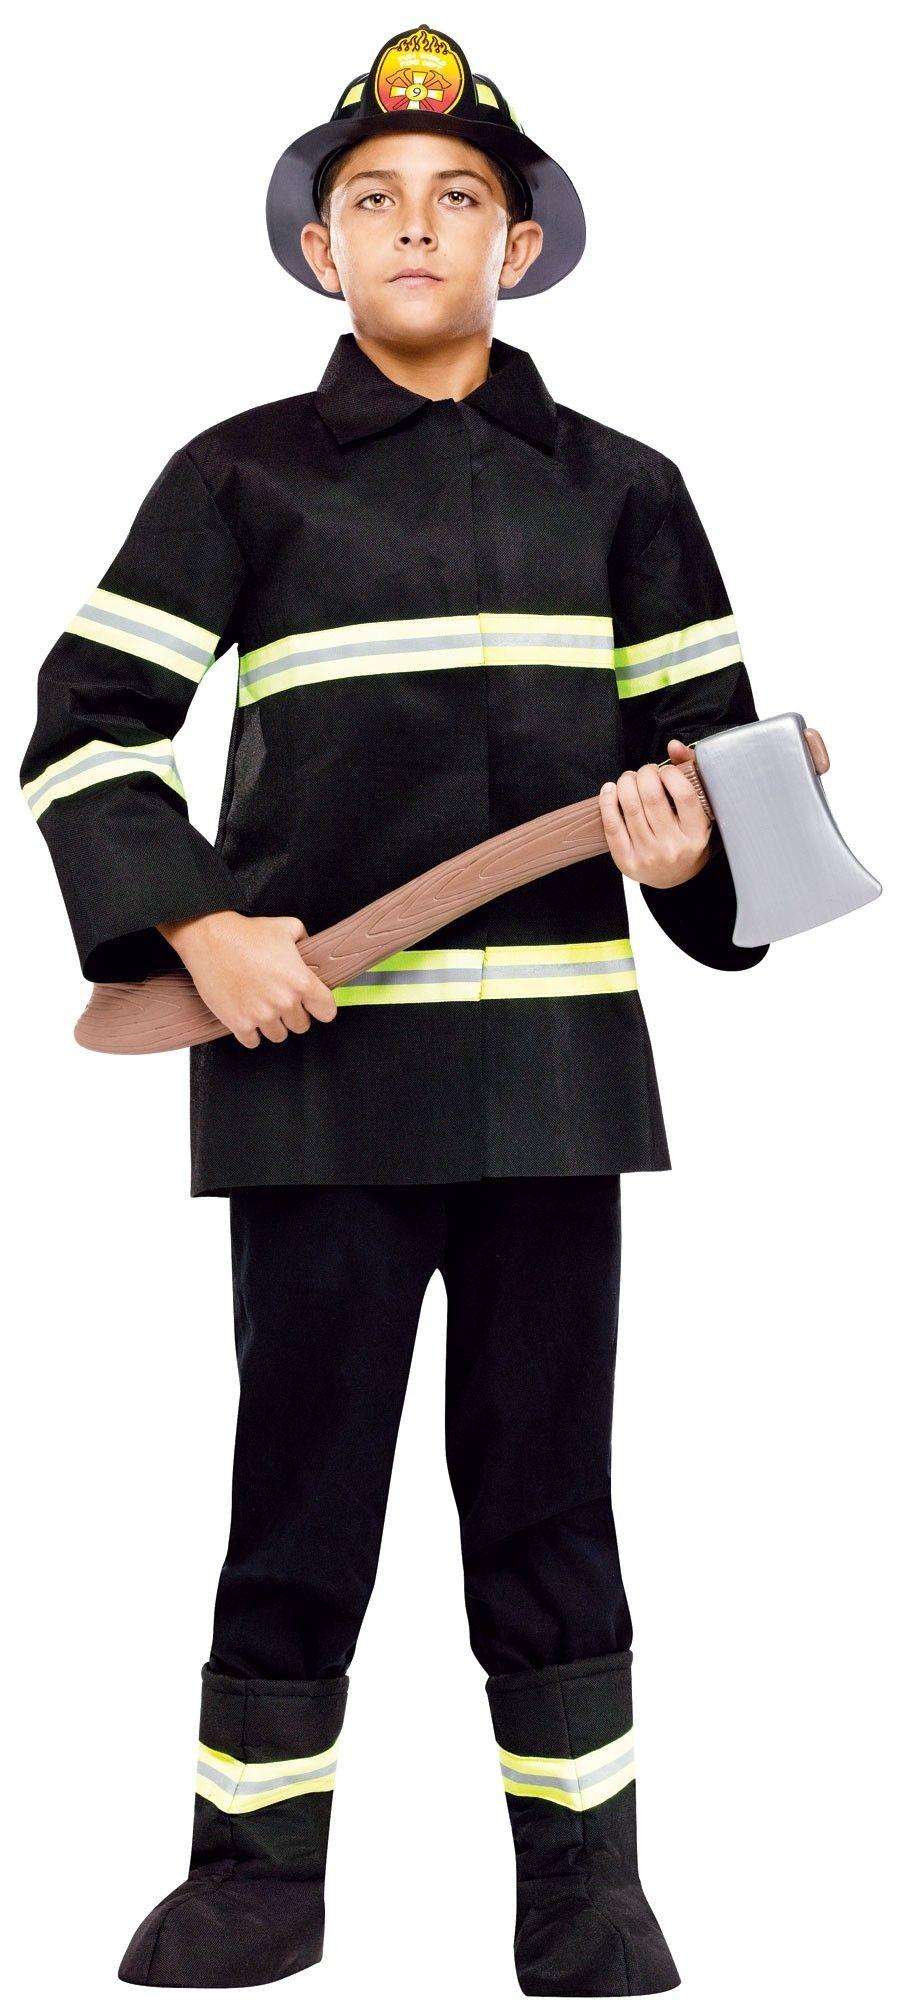 Детский костюм начальника пожарного (34-38) детский костюм озорного клоуна 34